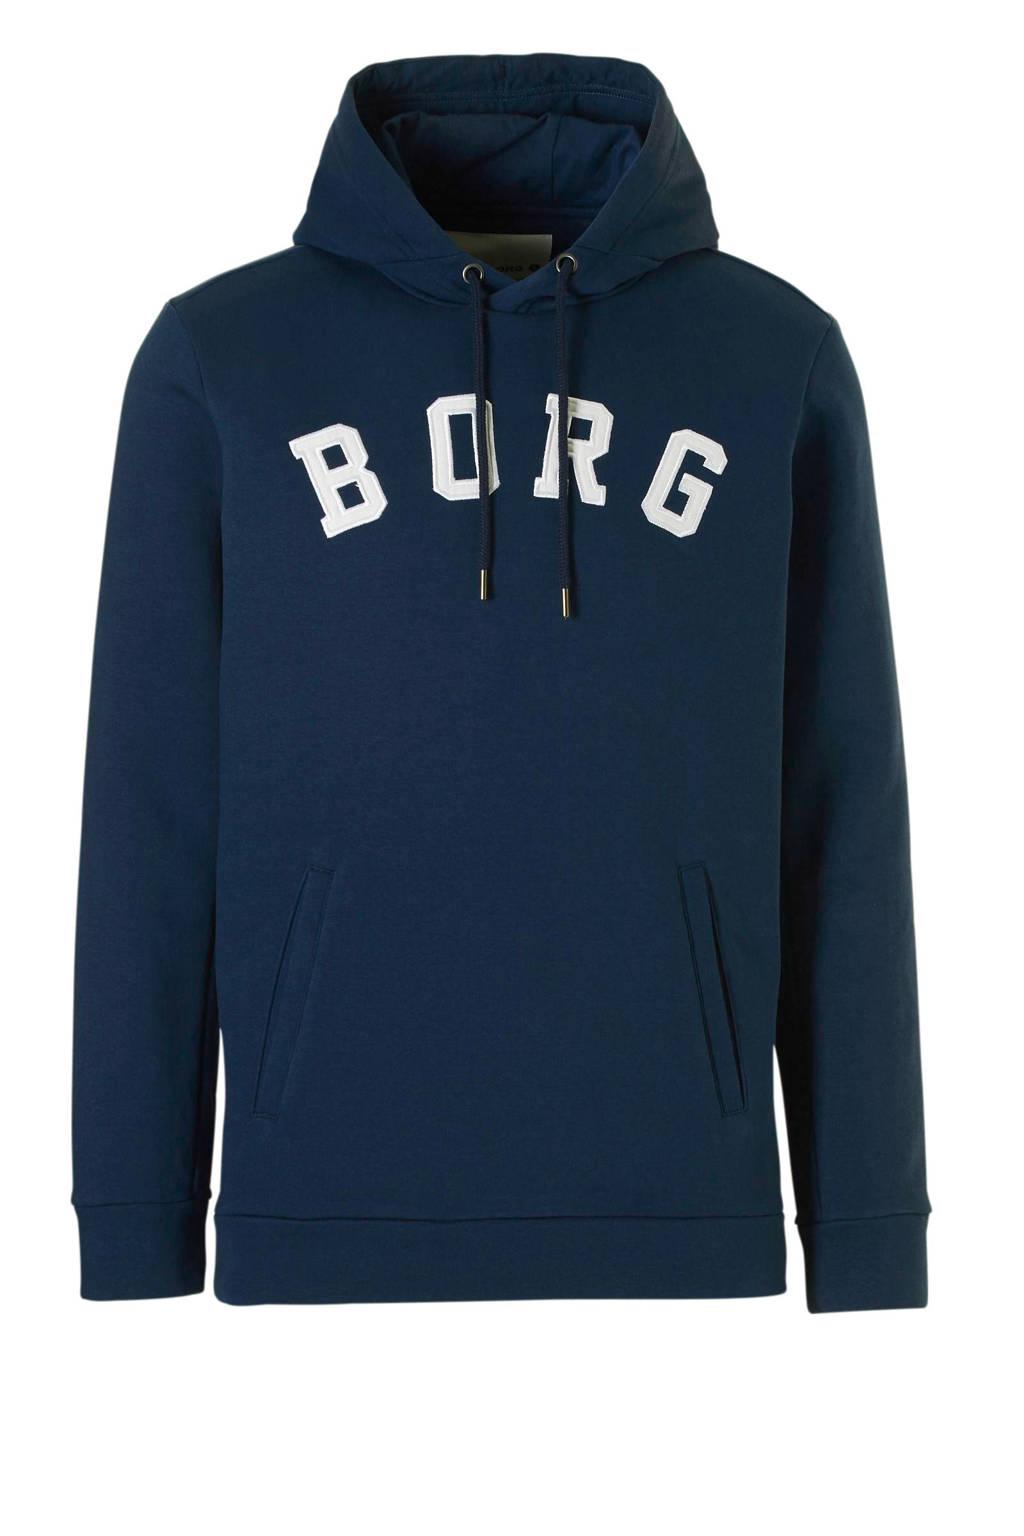 Björn Borg   sportsweater donkerblauw, Donkerblauw/wit